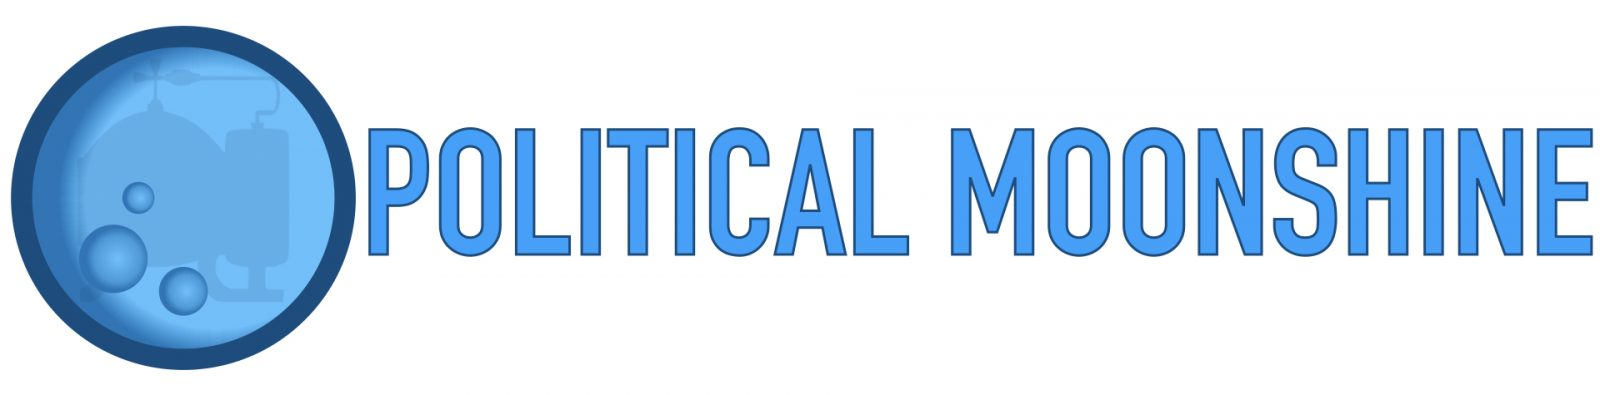 POLITICAL MOONSHINE